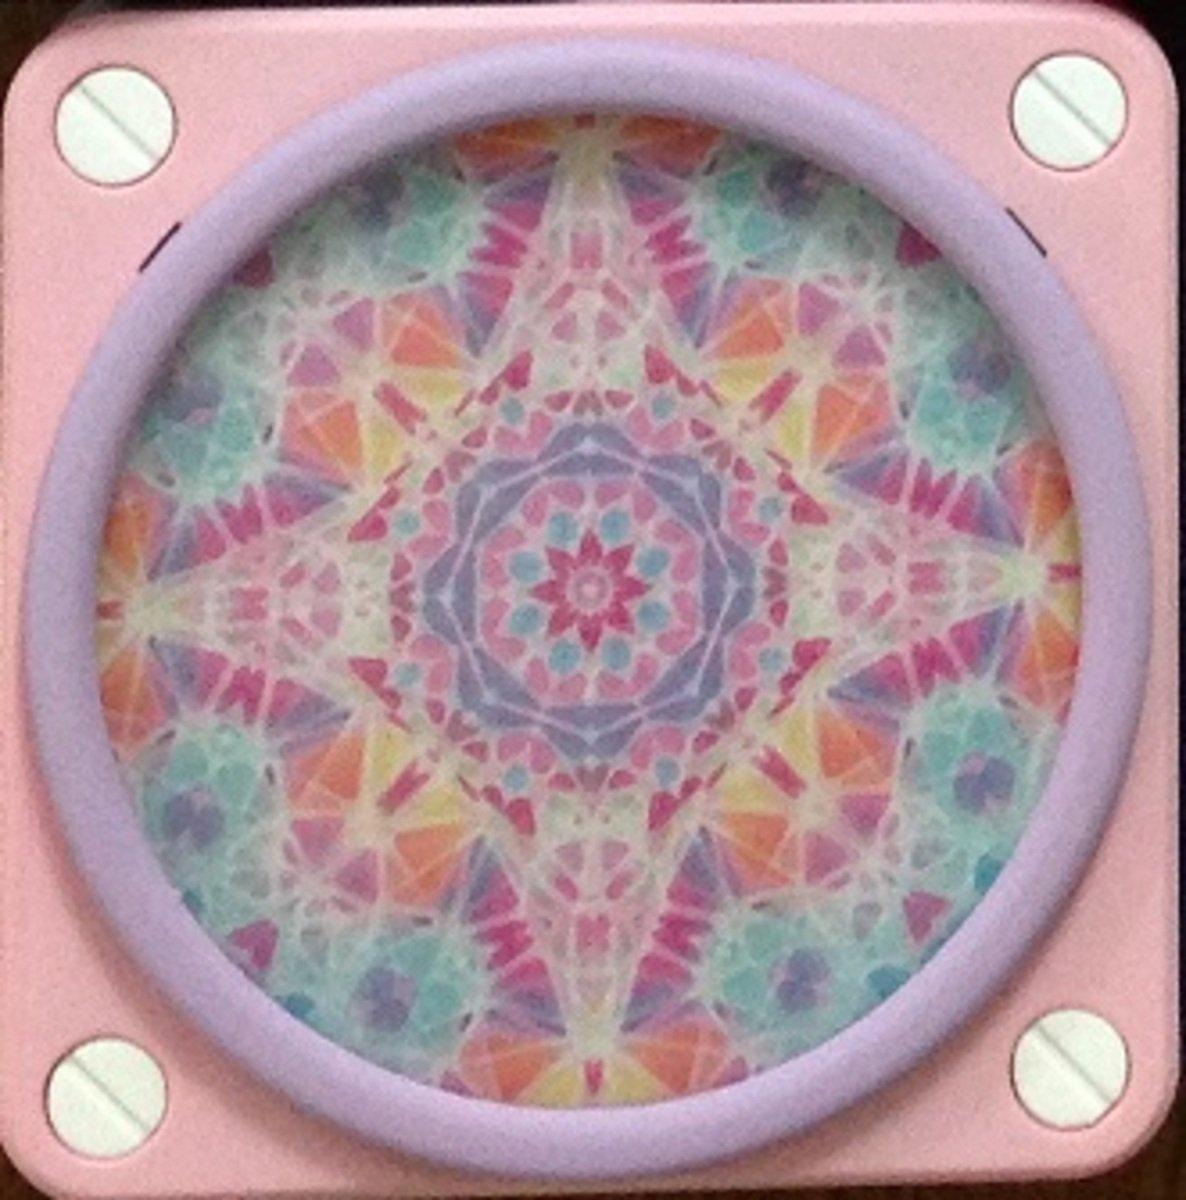 Kaleidoscope 5000mAh light power block